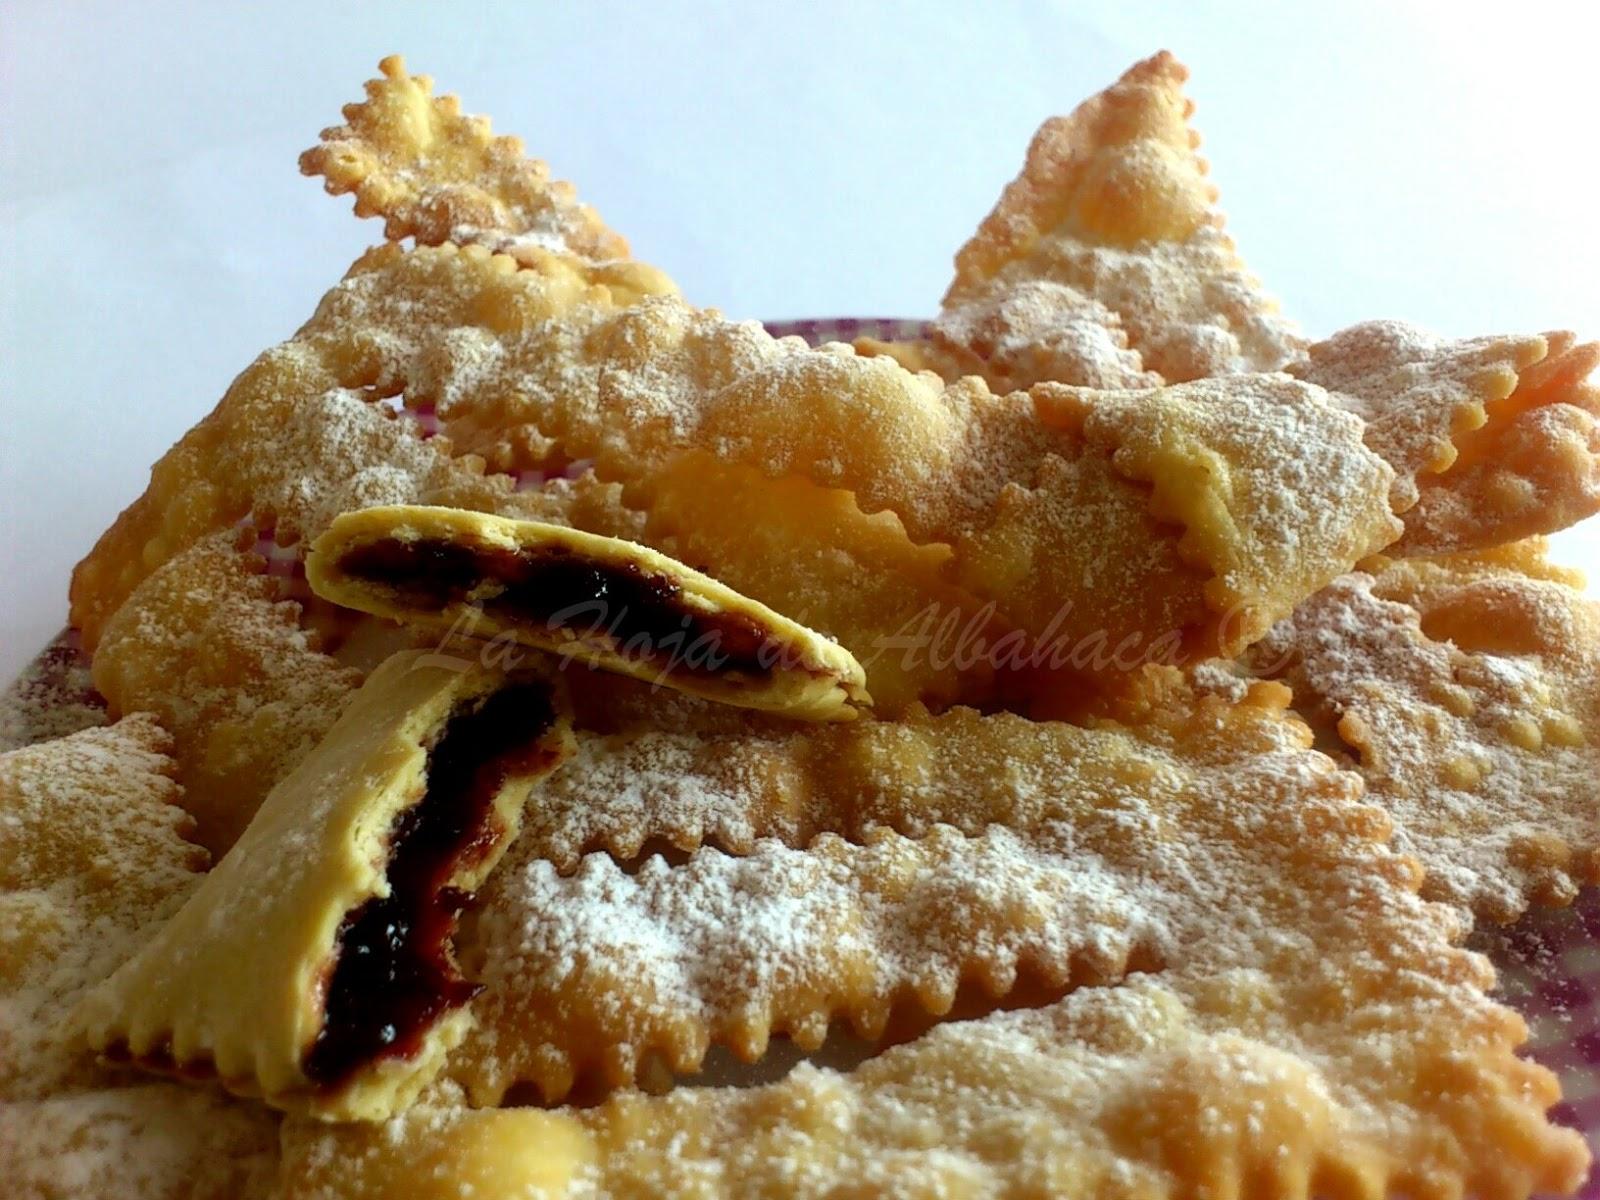 dulce italiano de carnaval, chiacchere, bugie, frappe